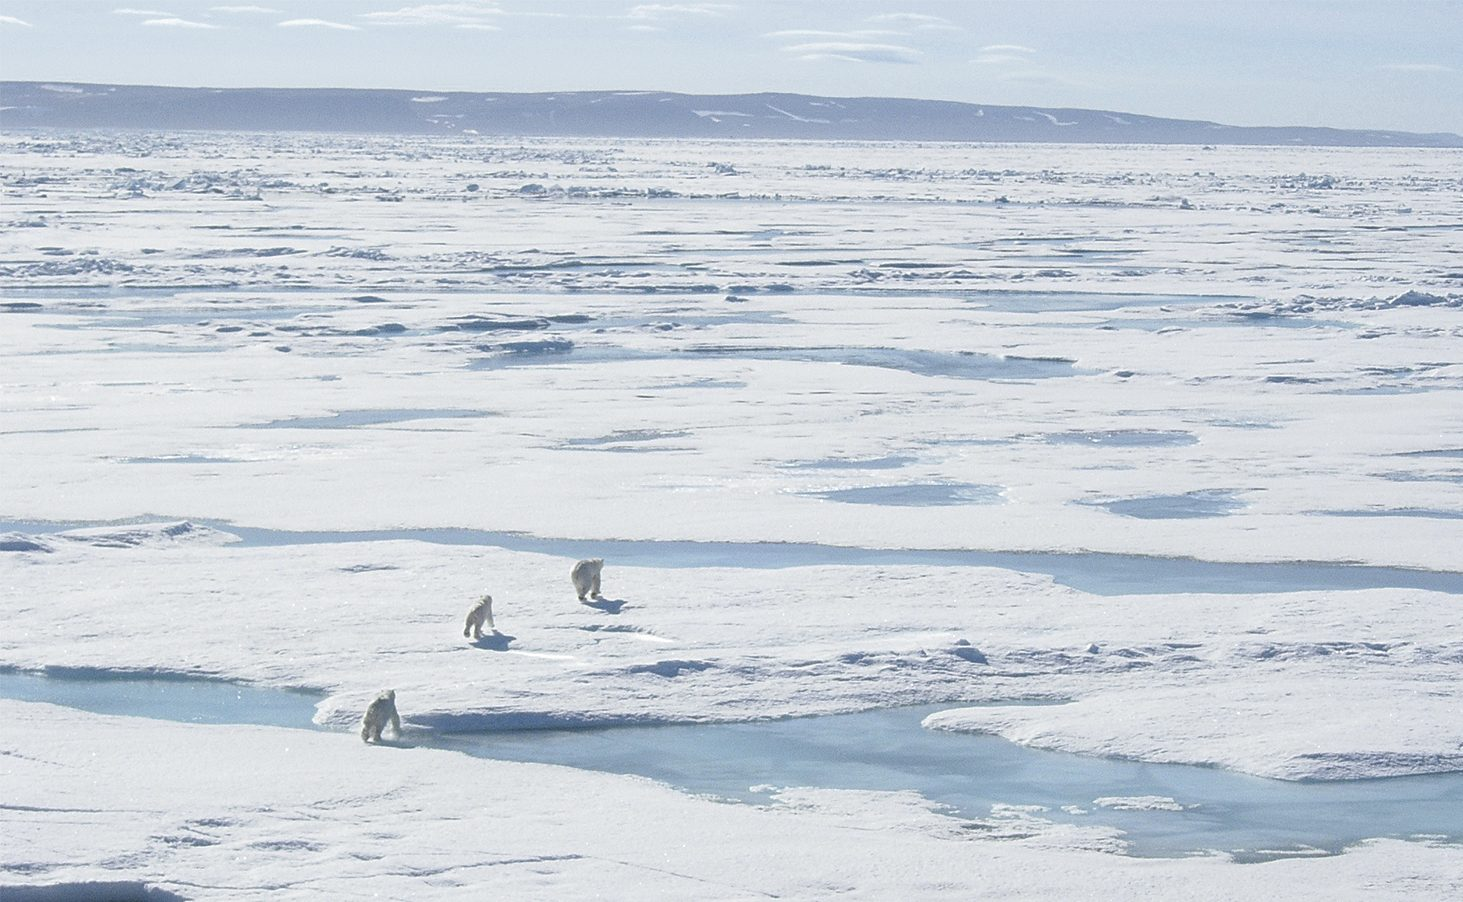 Polar Bears on journey